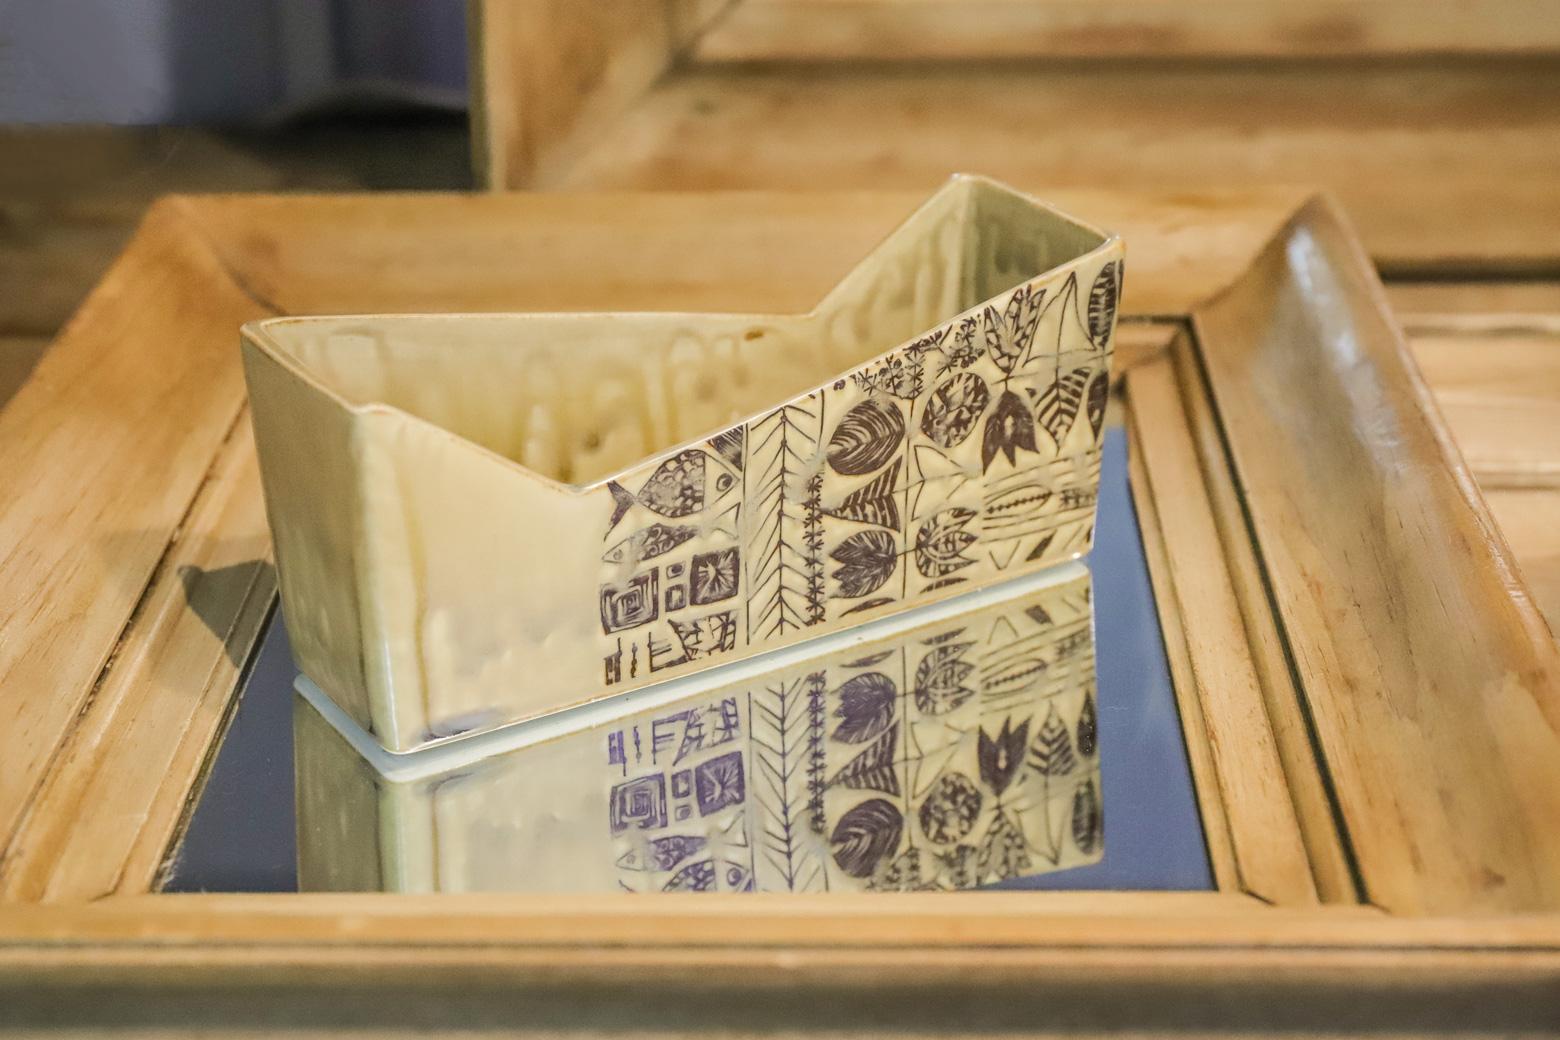 CHIZAN Flower Vase Japan Craft/知山陶苑 花器 安藤光一 ジャパン クラフト 陶芸 美濃焼